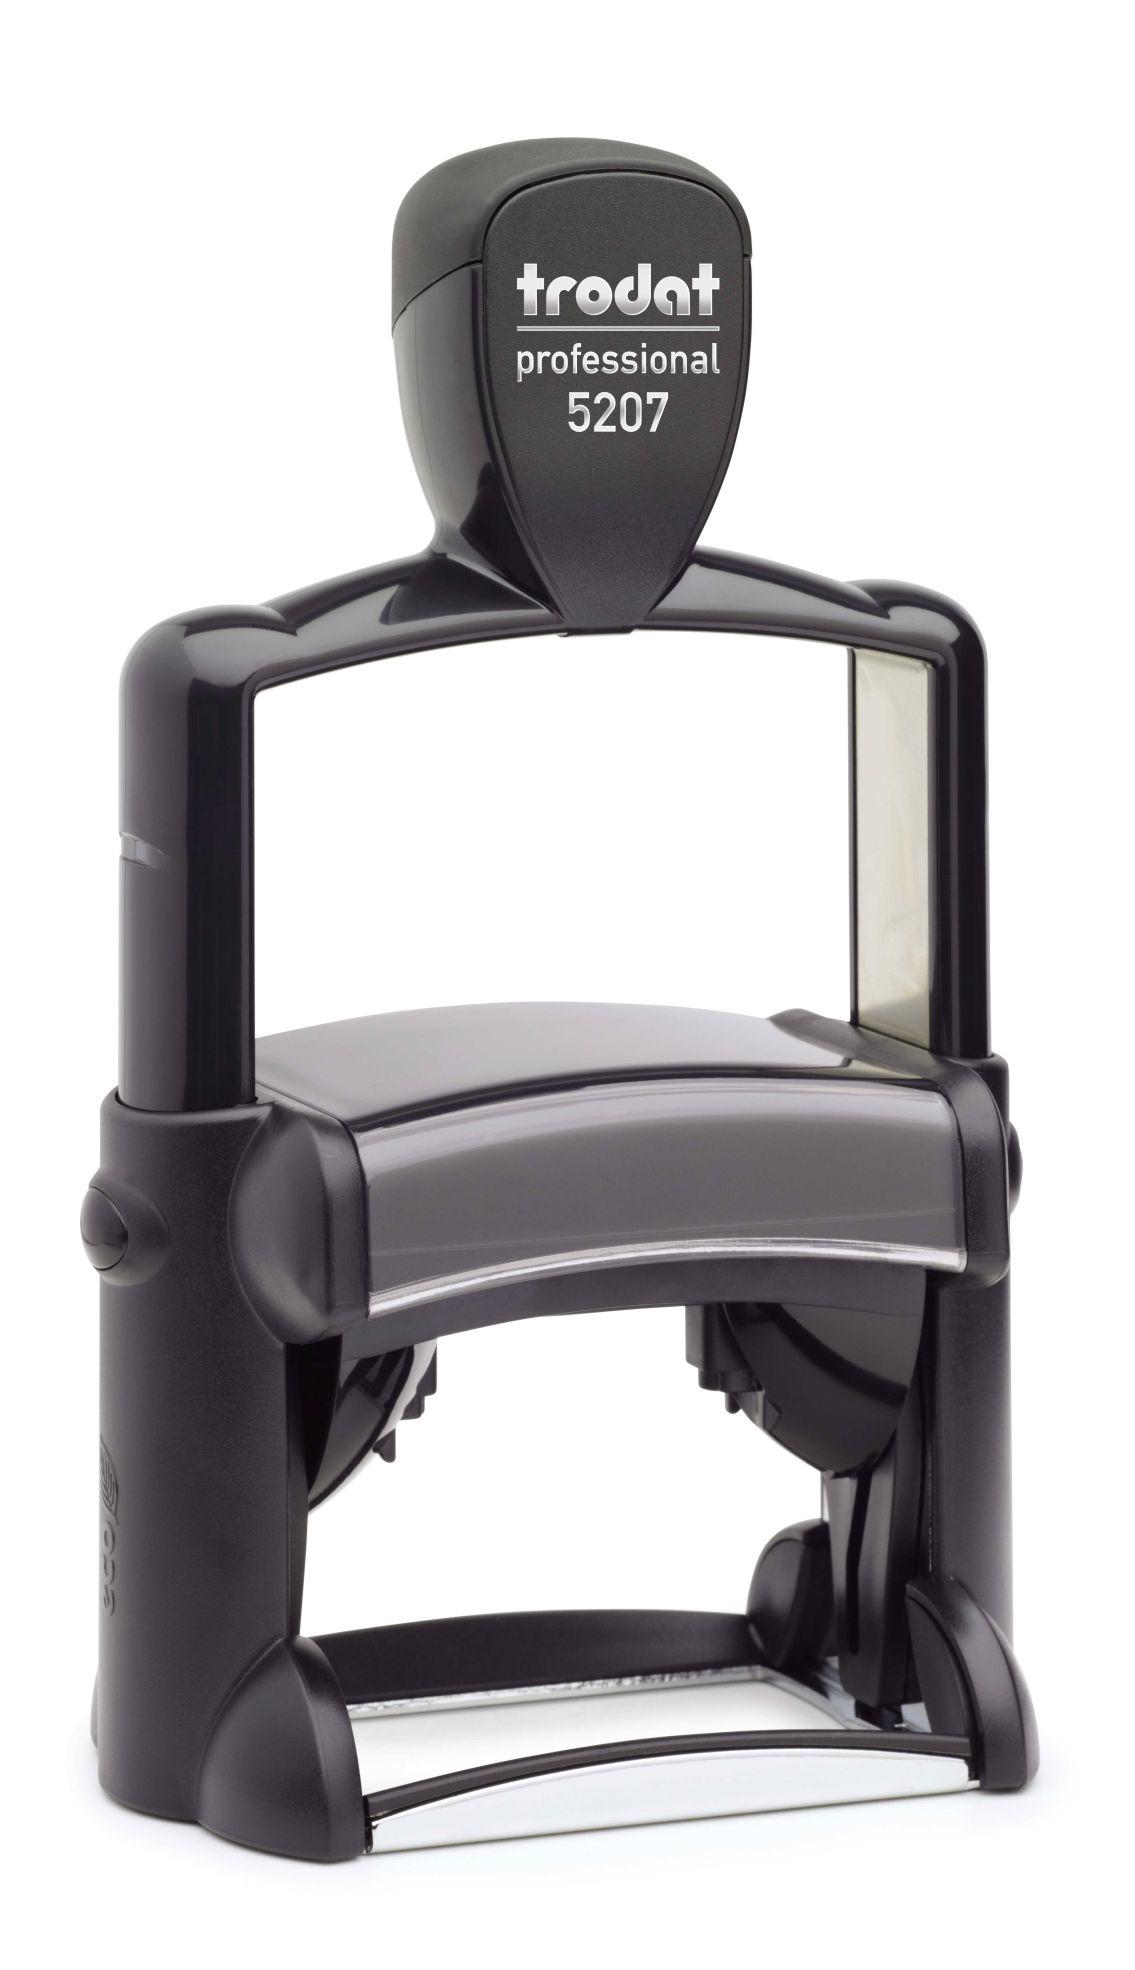 trodat professional 5207 auftragsbest tigung gepr ft schnell automotive e k. Black Bedroom Furniture Sets. Home Design Ideas